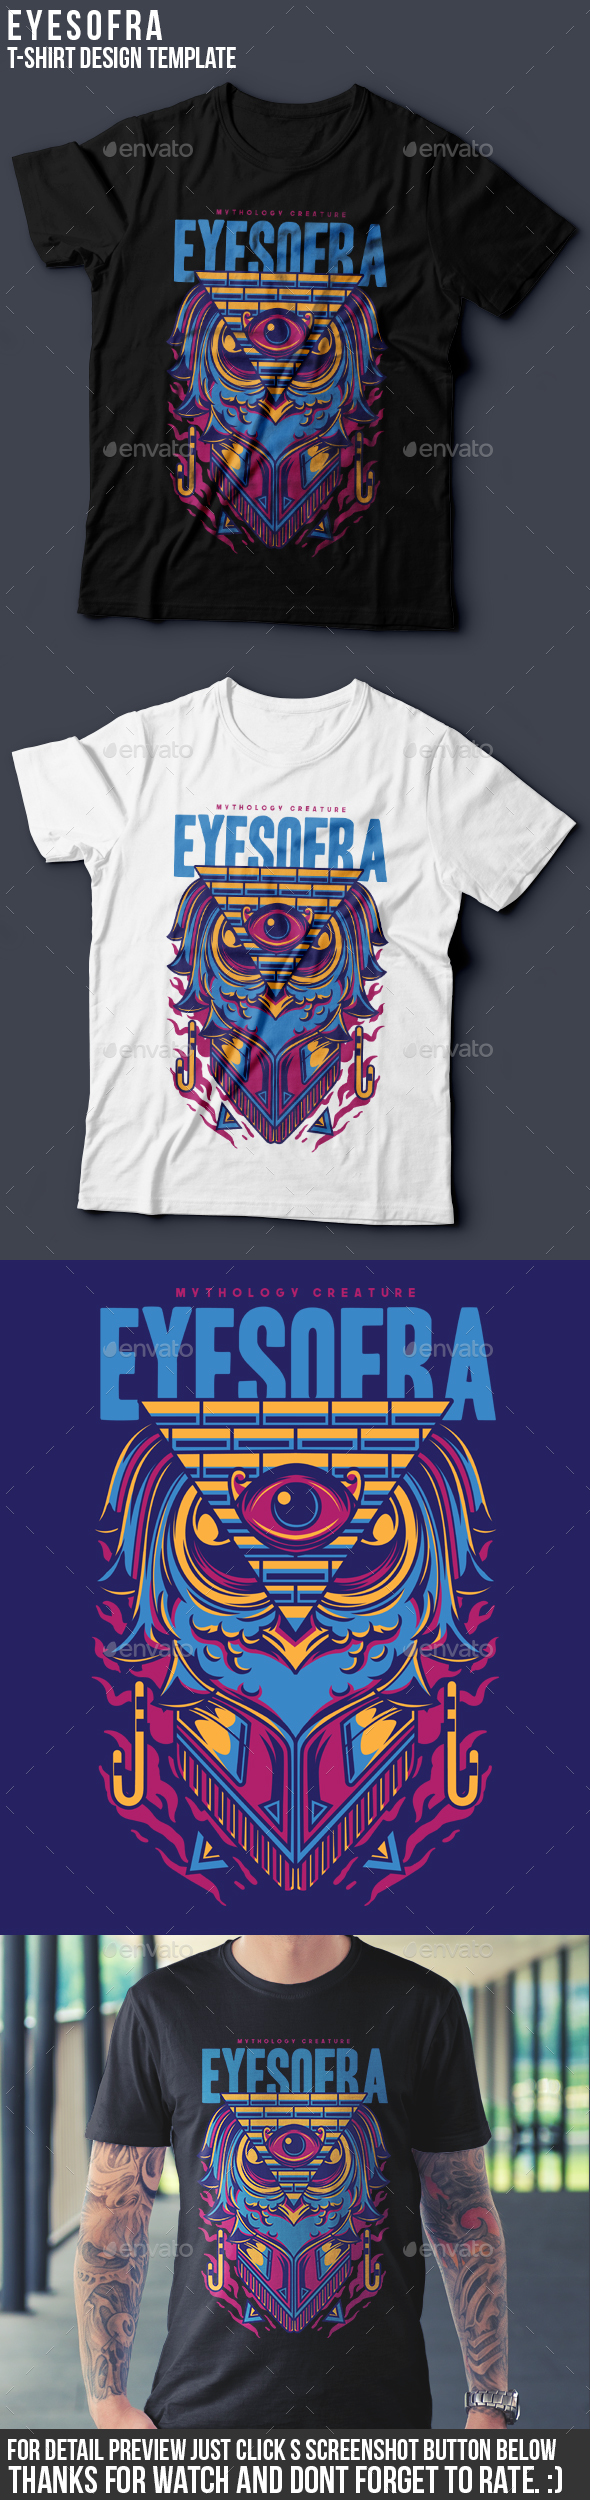 Eyes of Ra T-Shirt Design - Clean Designs